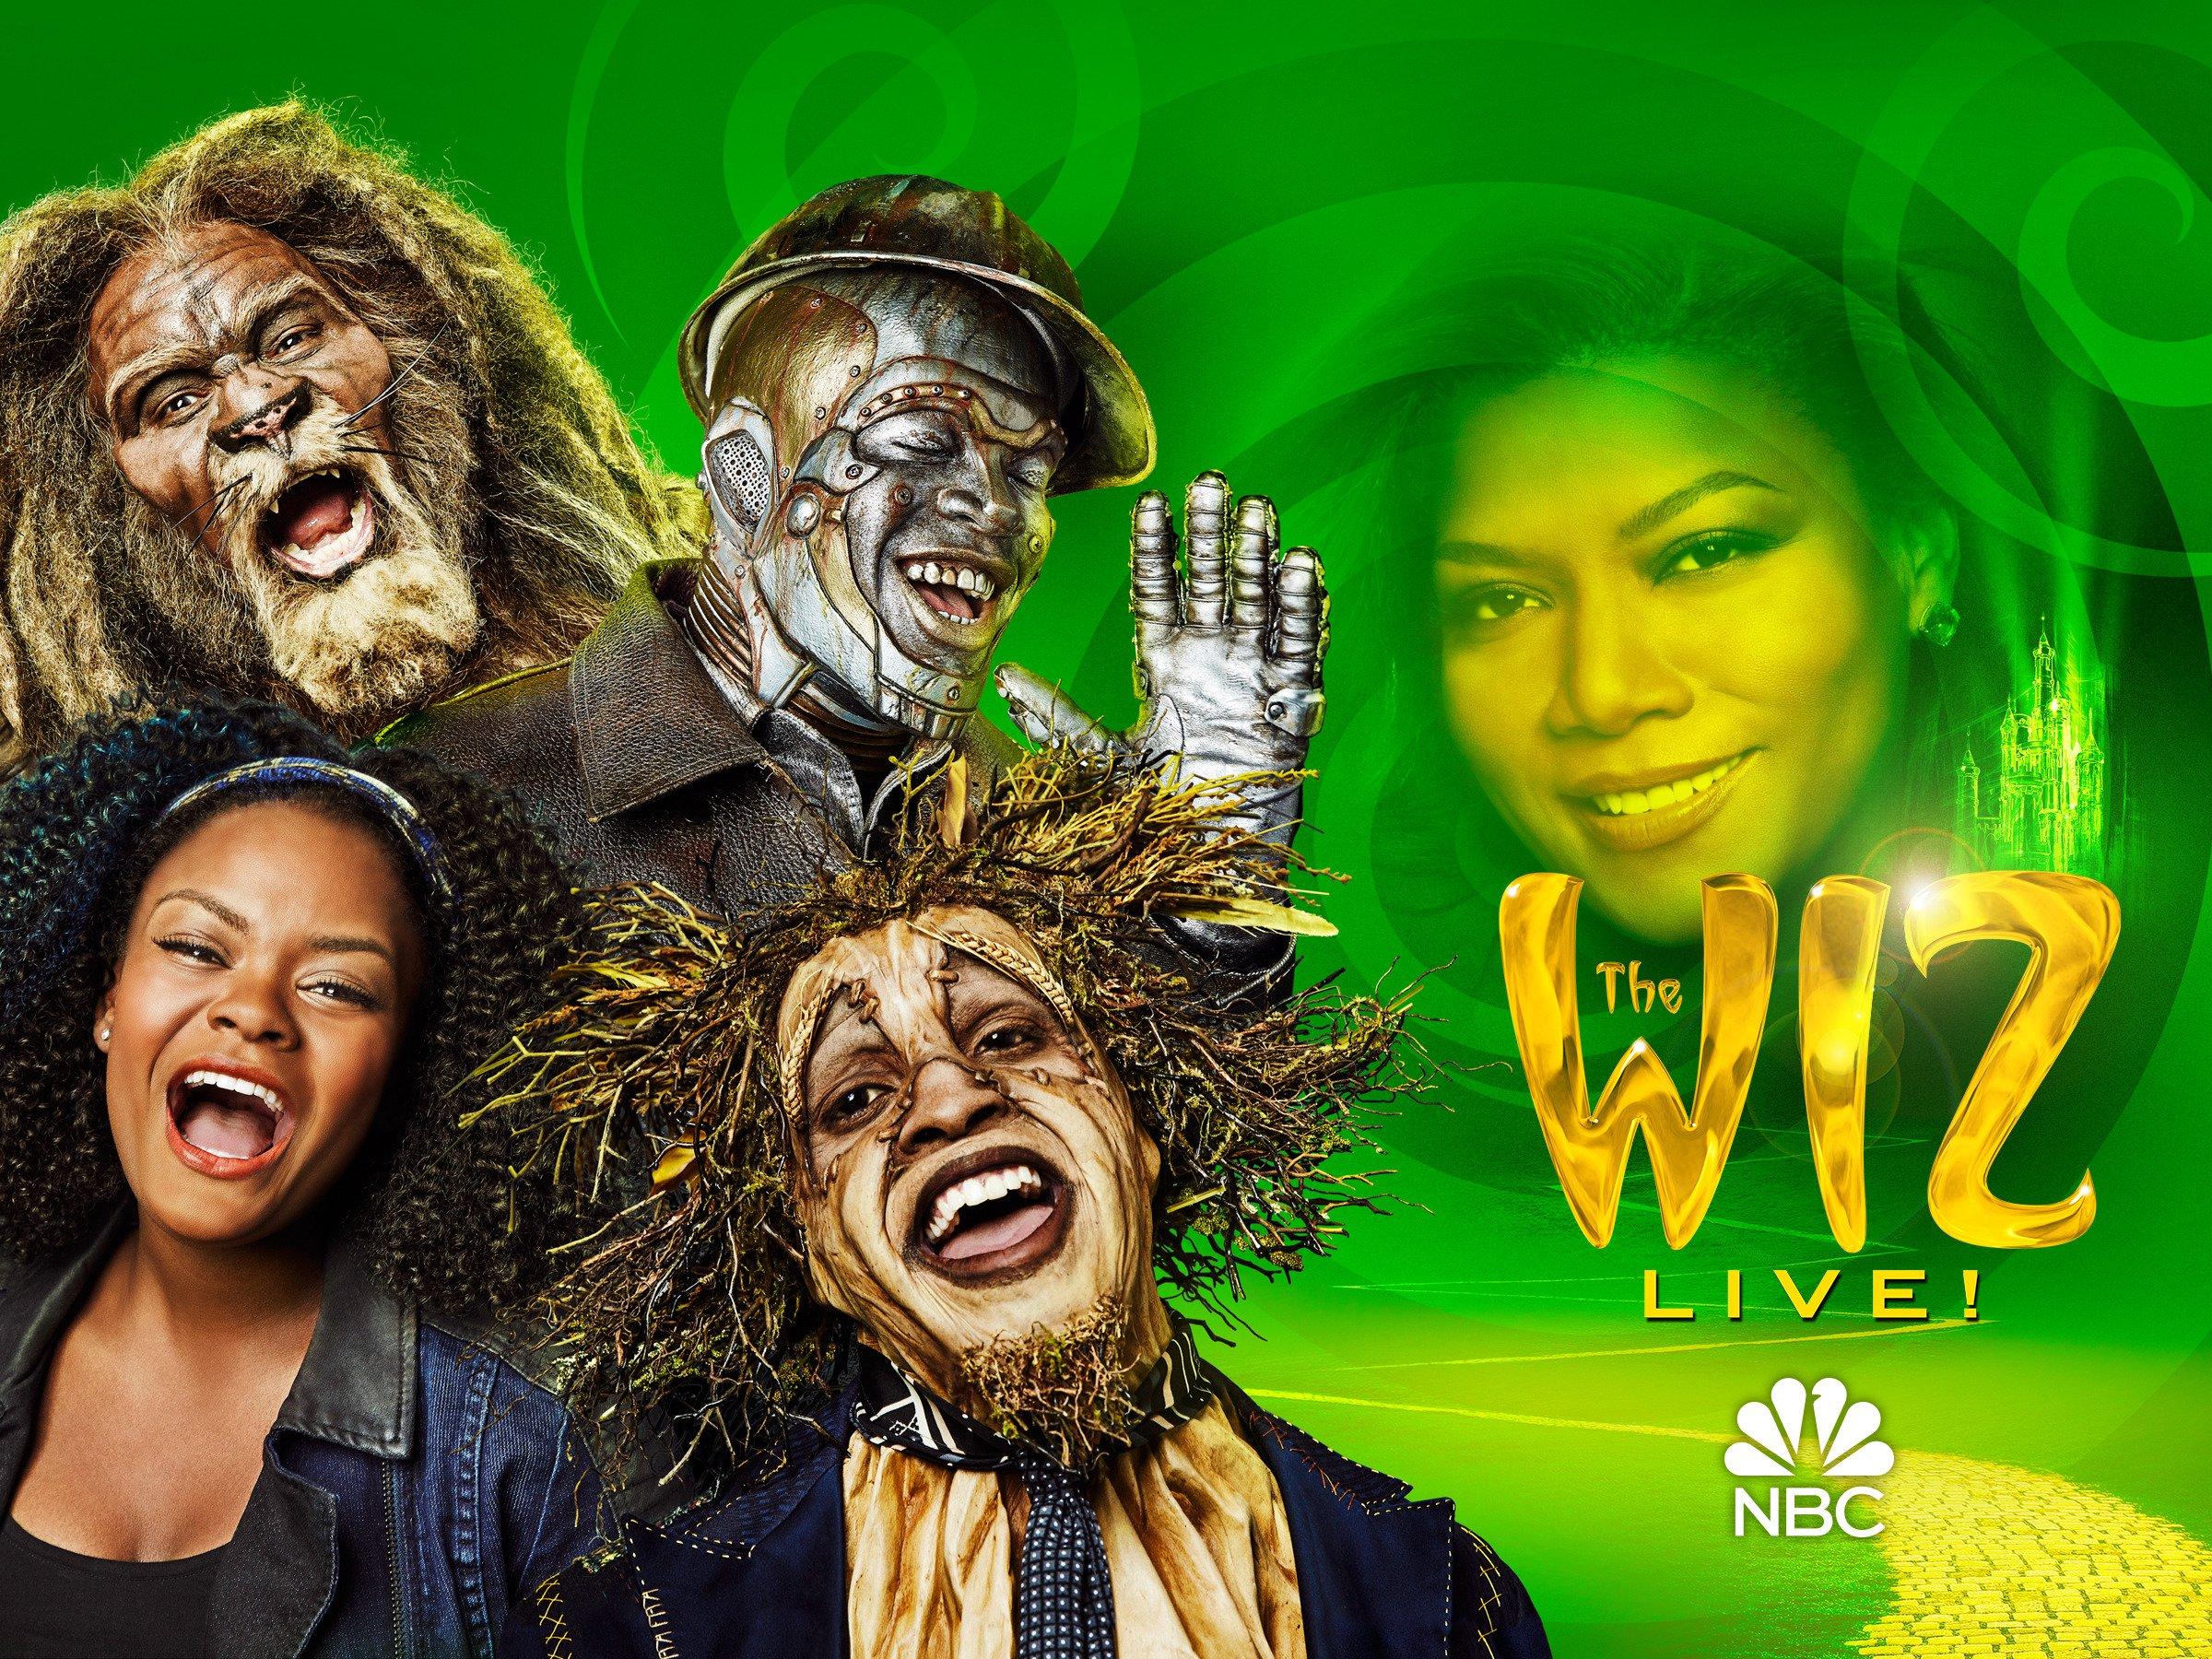 Amazon.com: Watch The Wiz Live! | Prime Video